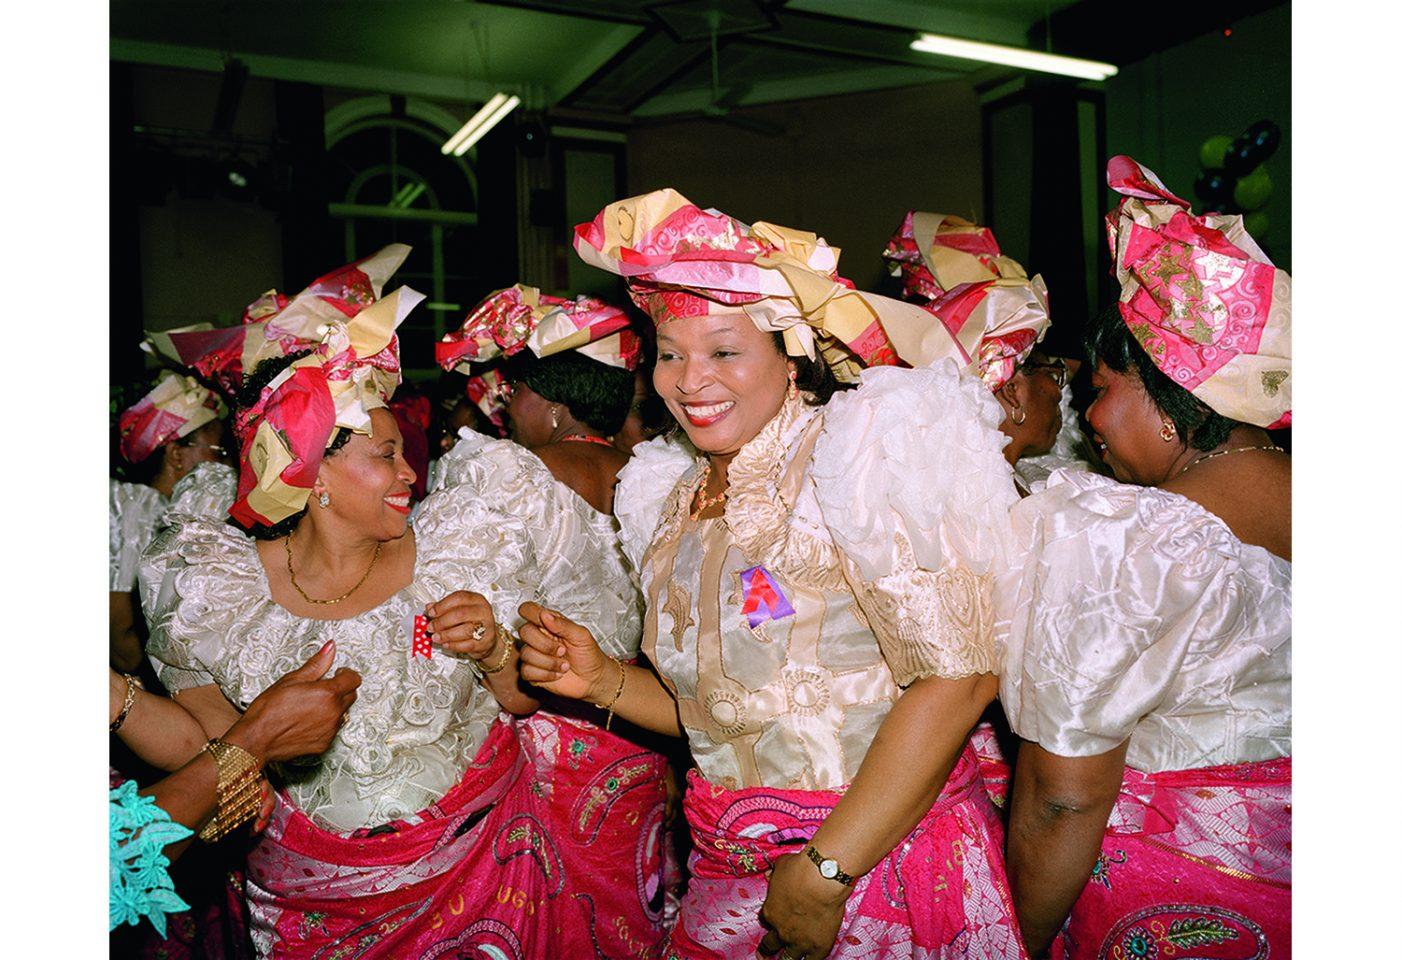 Liz Johnson Artur, Nigerian Party, 1995